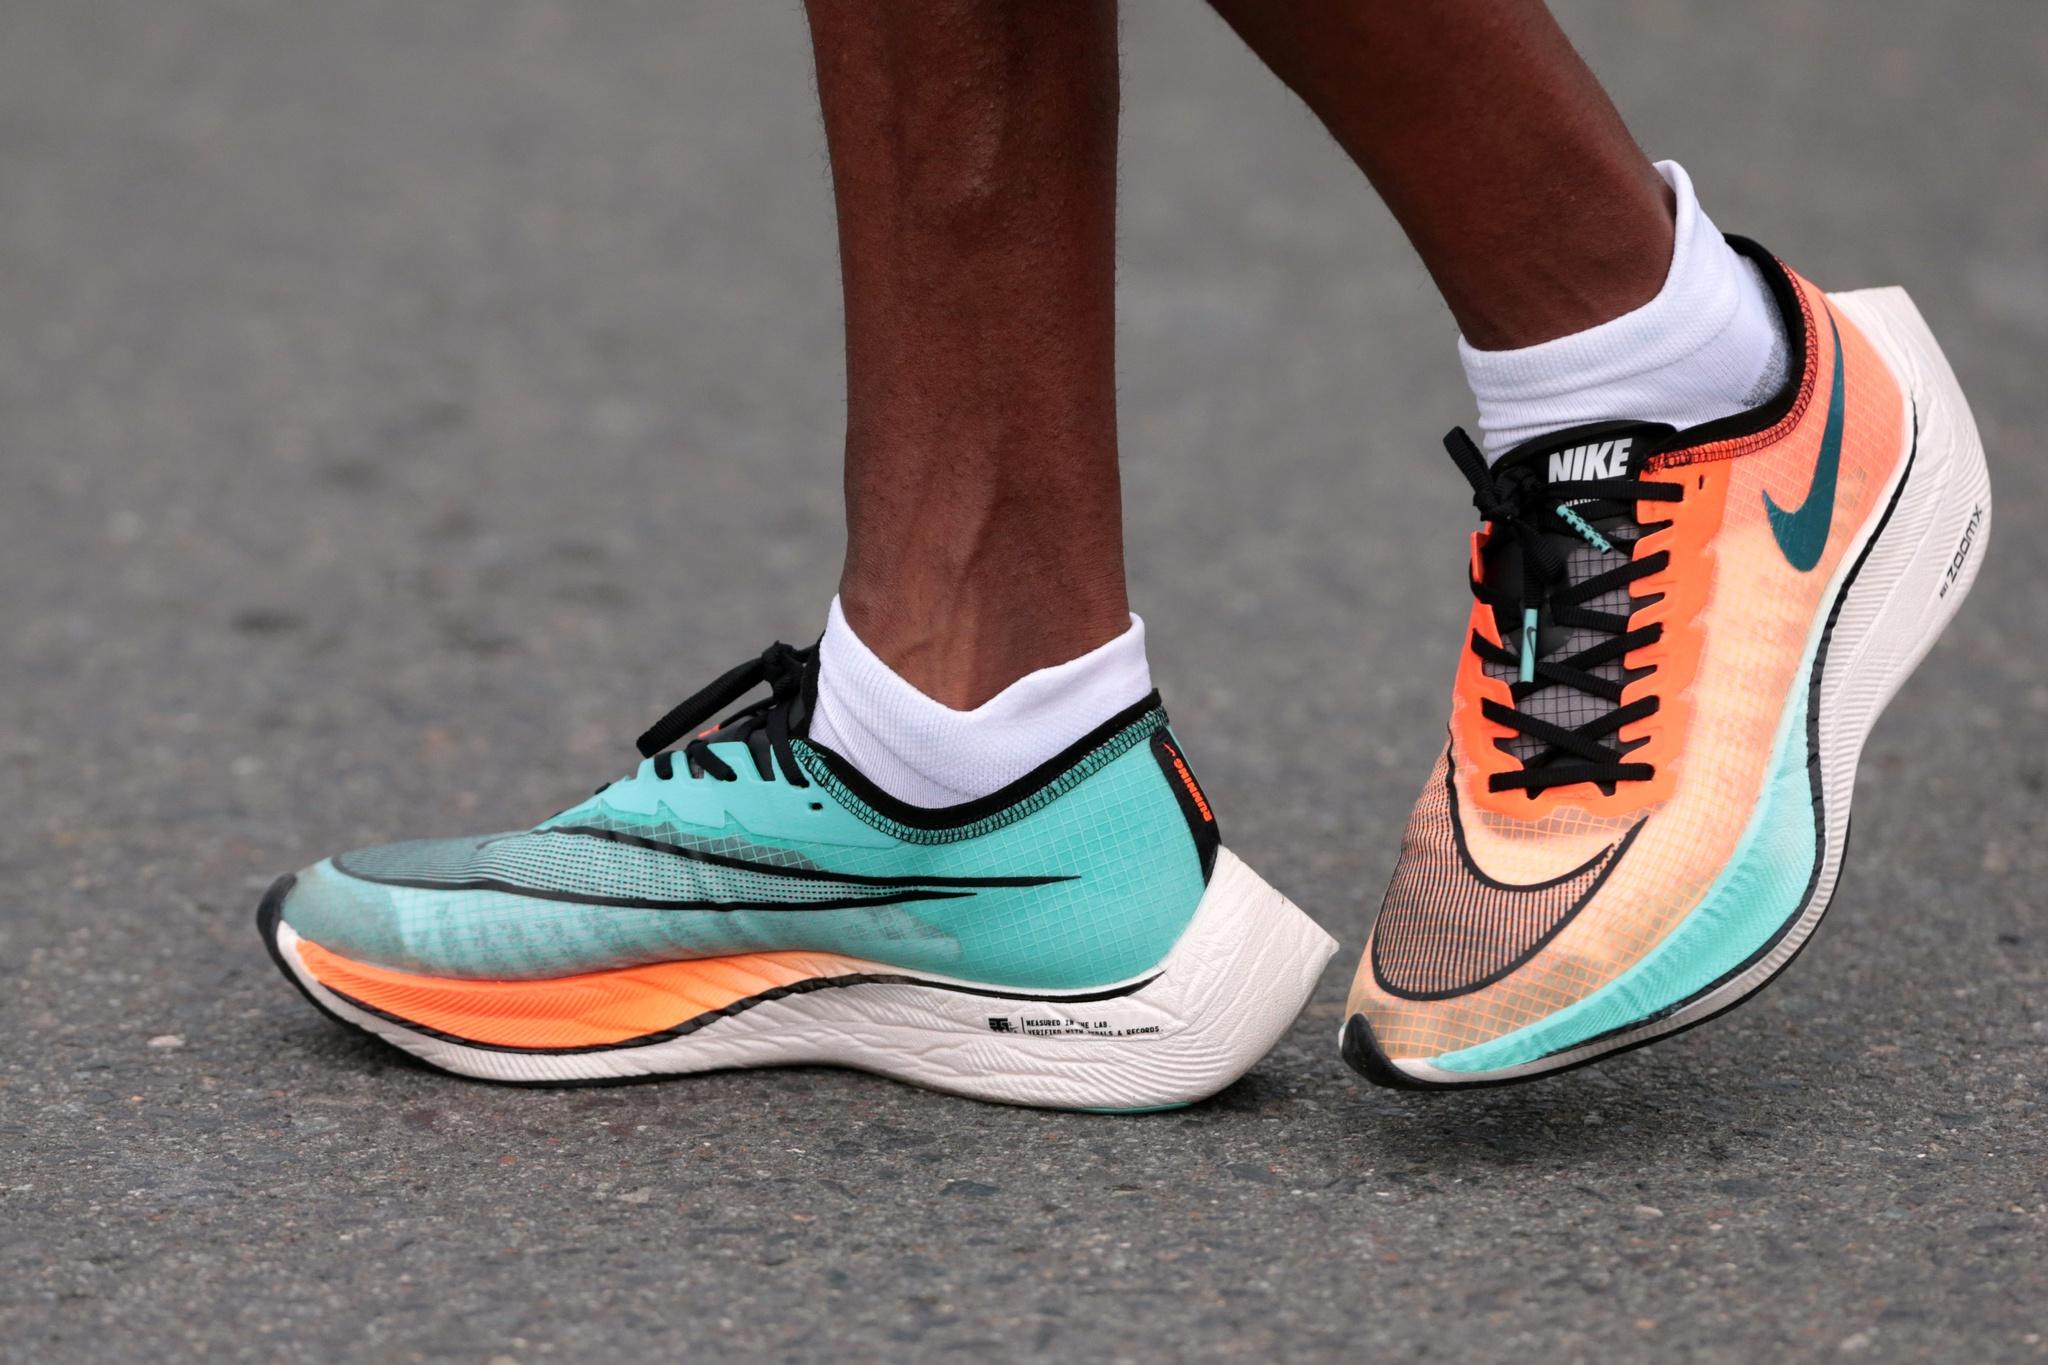 "Nike ""estica"" as sapatilhas até ao máximo permitido"